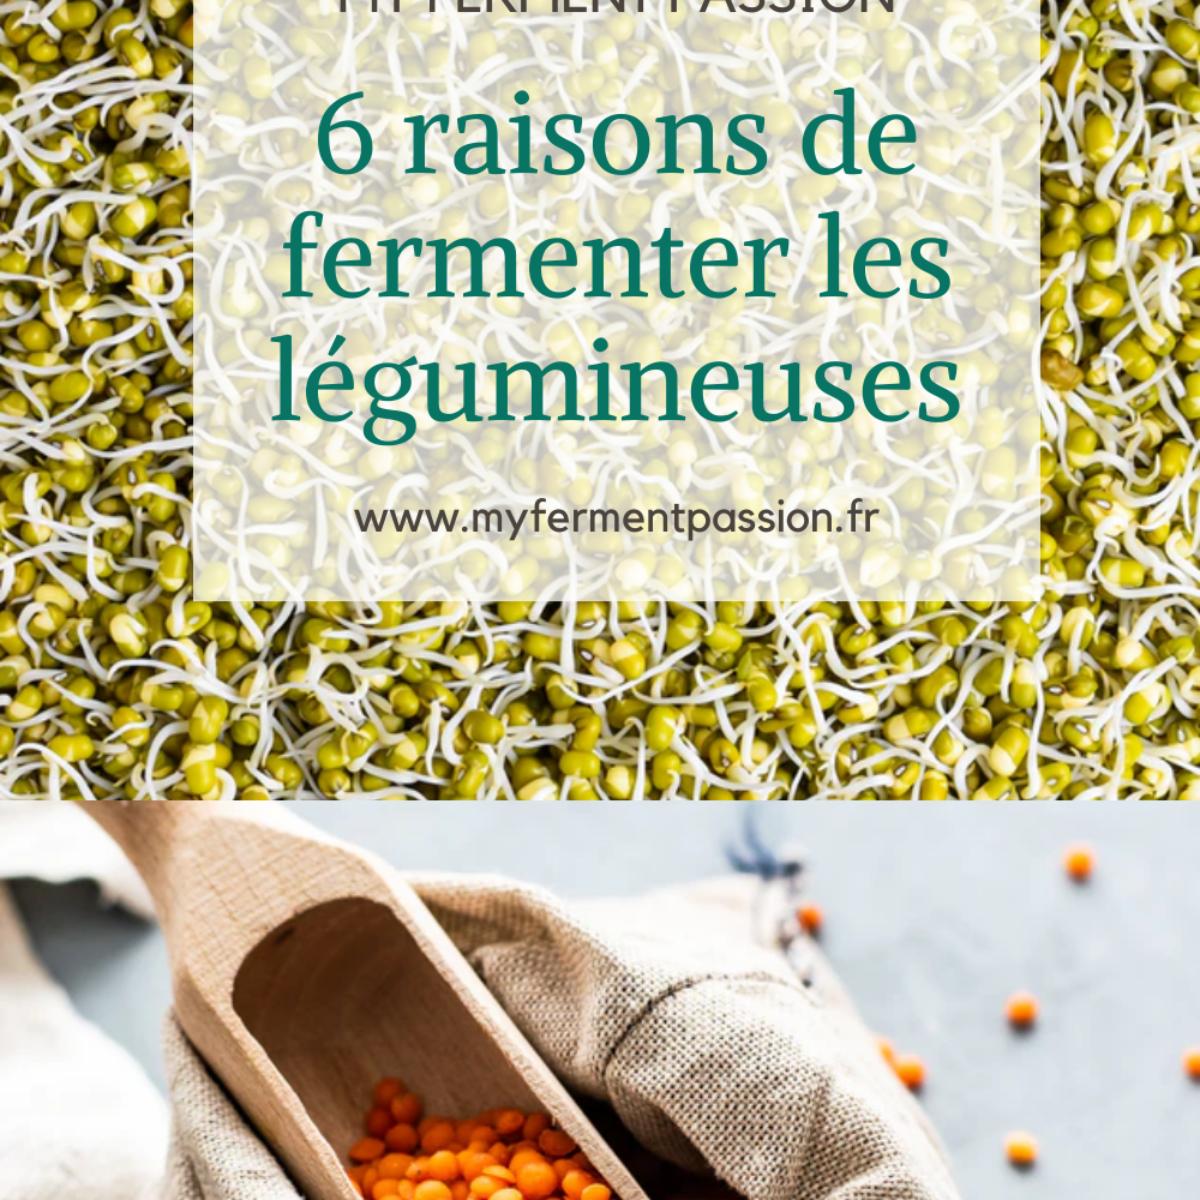 légumineuses fermentation